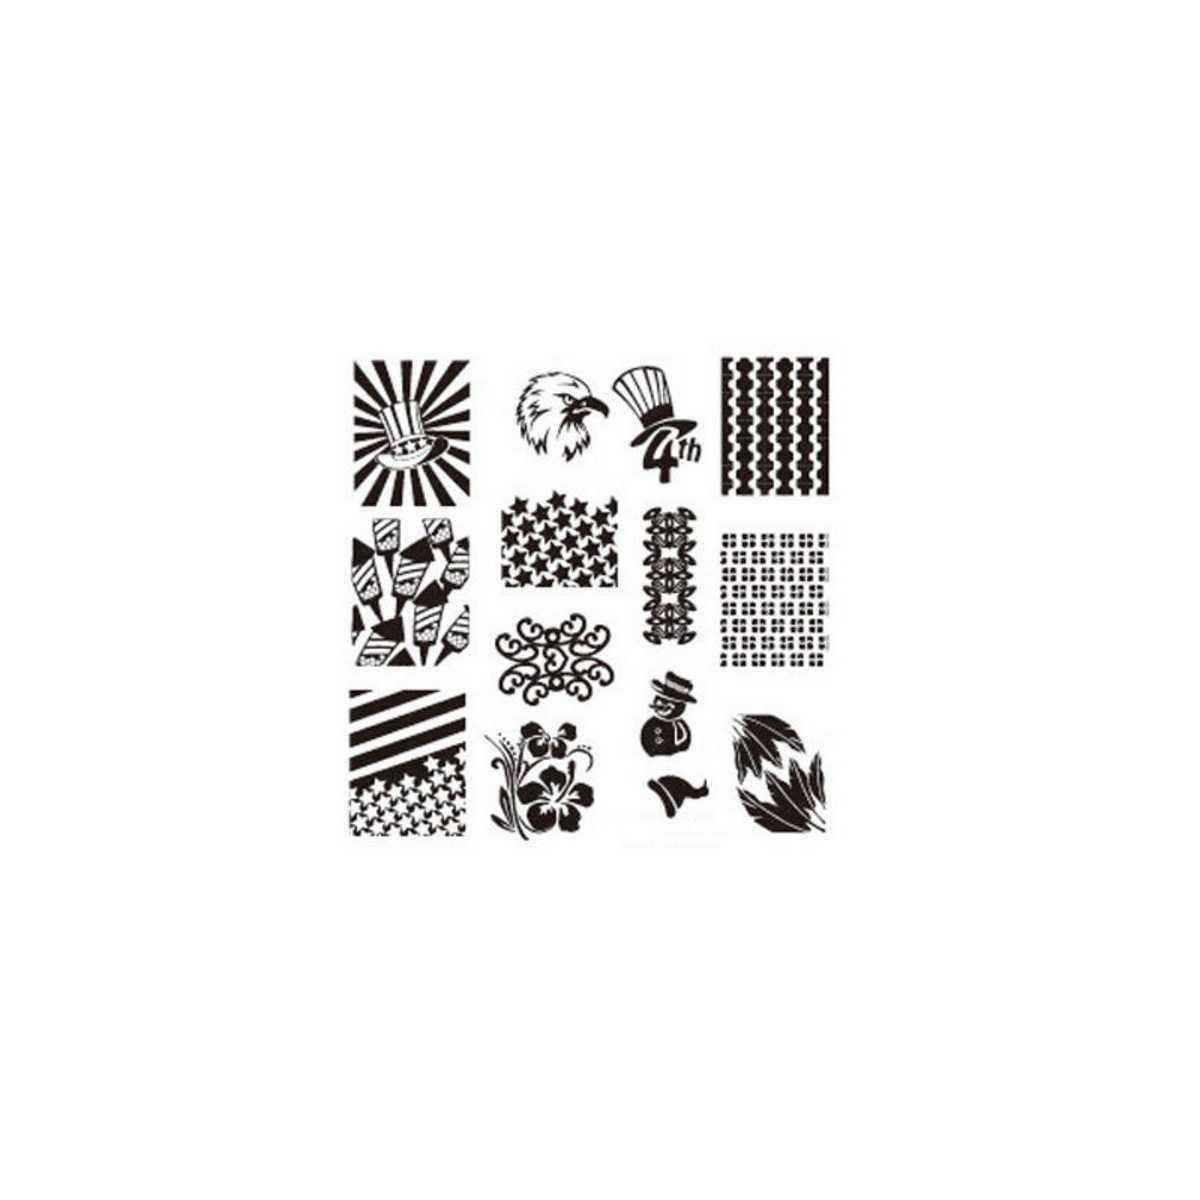 https://www.kit-manucure.com/1029-thickbox_default/plaque-de-stamping-usa-etoiles-aigle-plumes.jpg